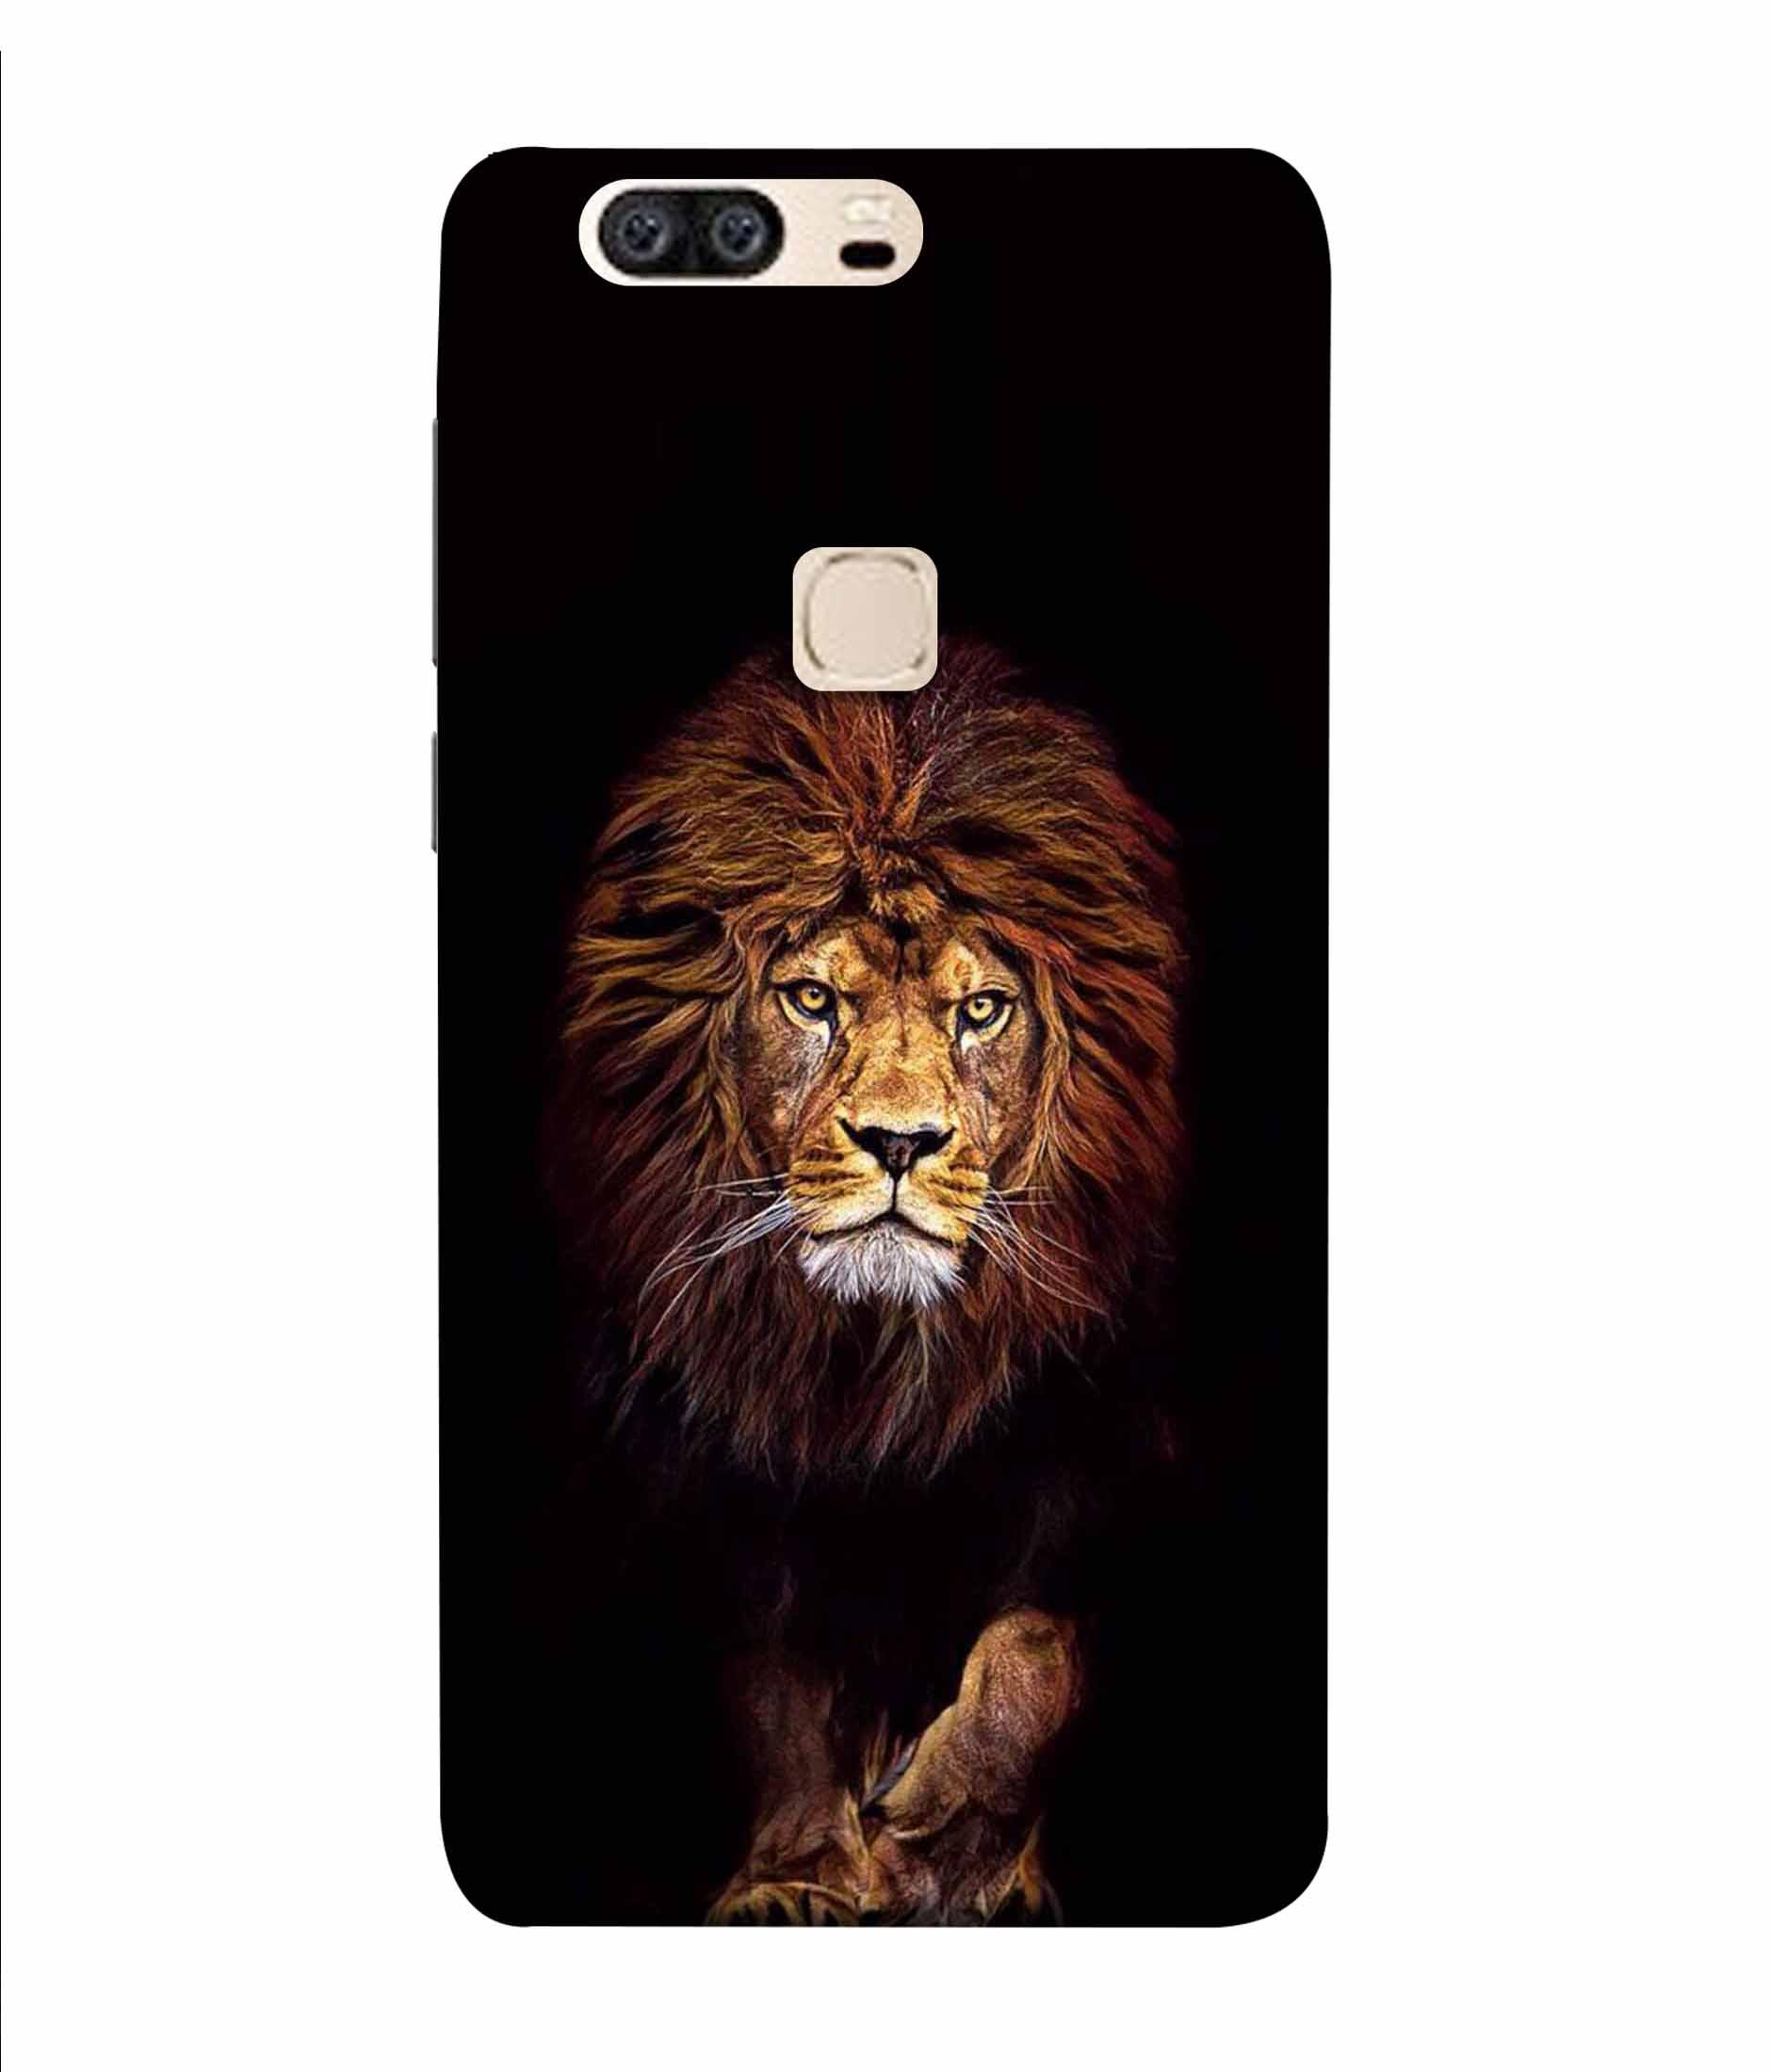 Lion Wallpaper Honor 7c Mobile Back Covers - Crazy Lion , HD Wallpaper & Backgrounds